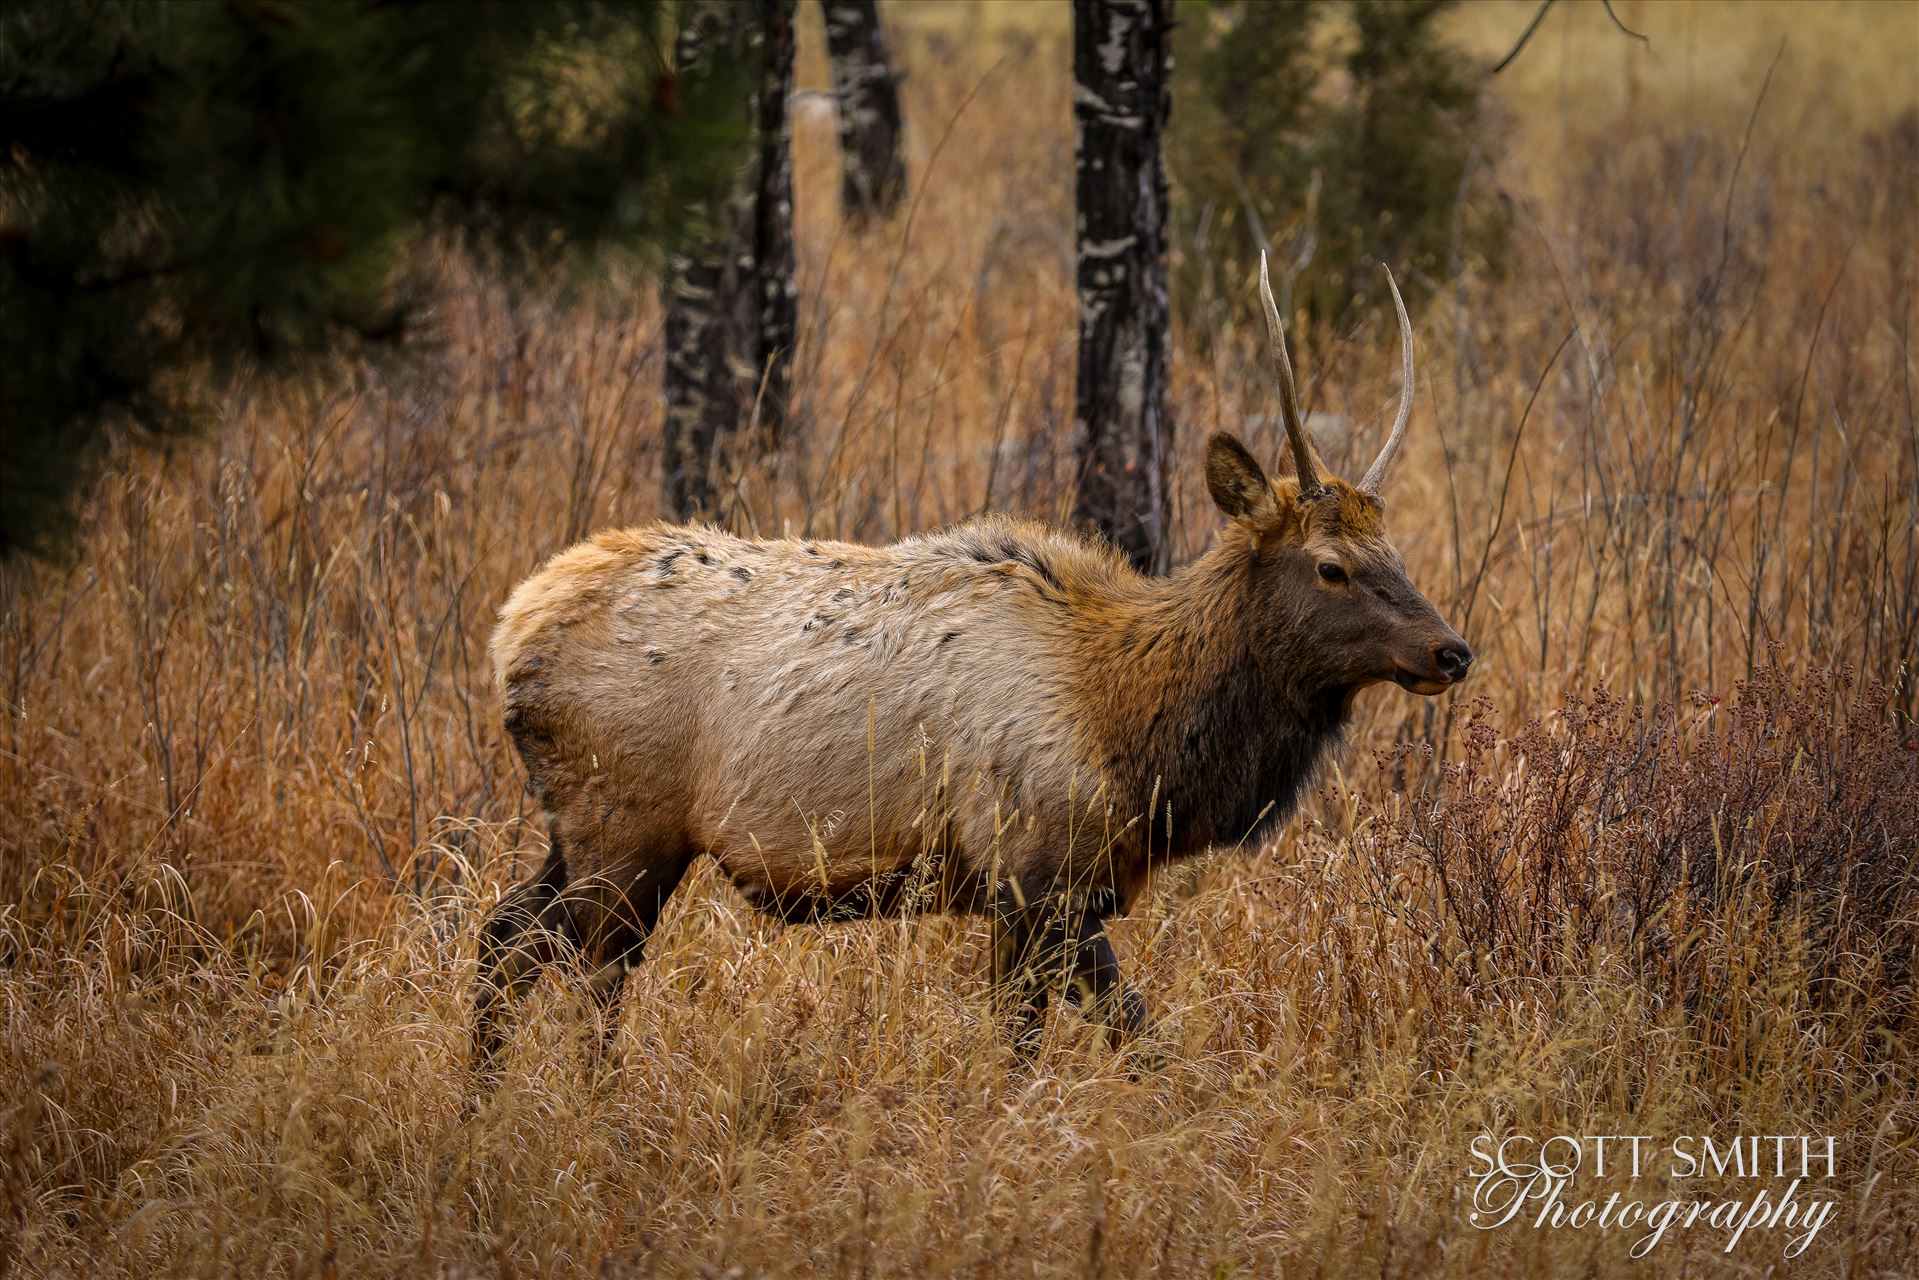 Sunday Elk No 04 - A heard of Elk near the entrance to Rocky Mountain National Park, Estes Park, Colorado. by D Scott Smith